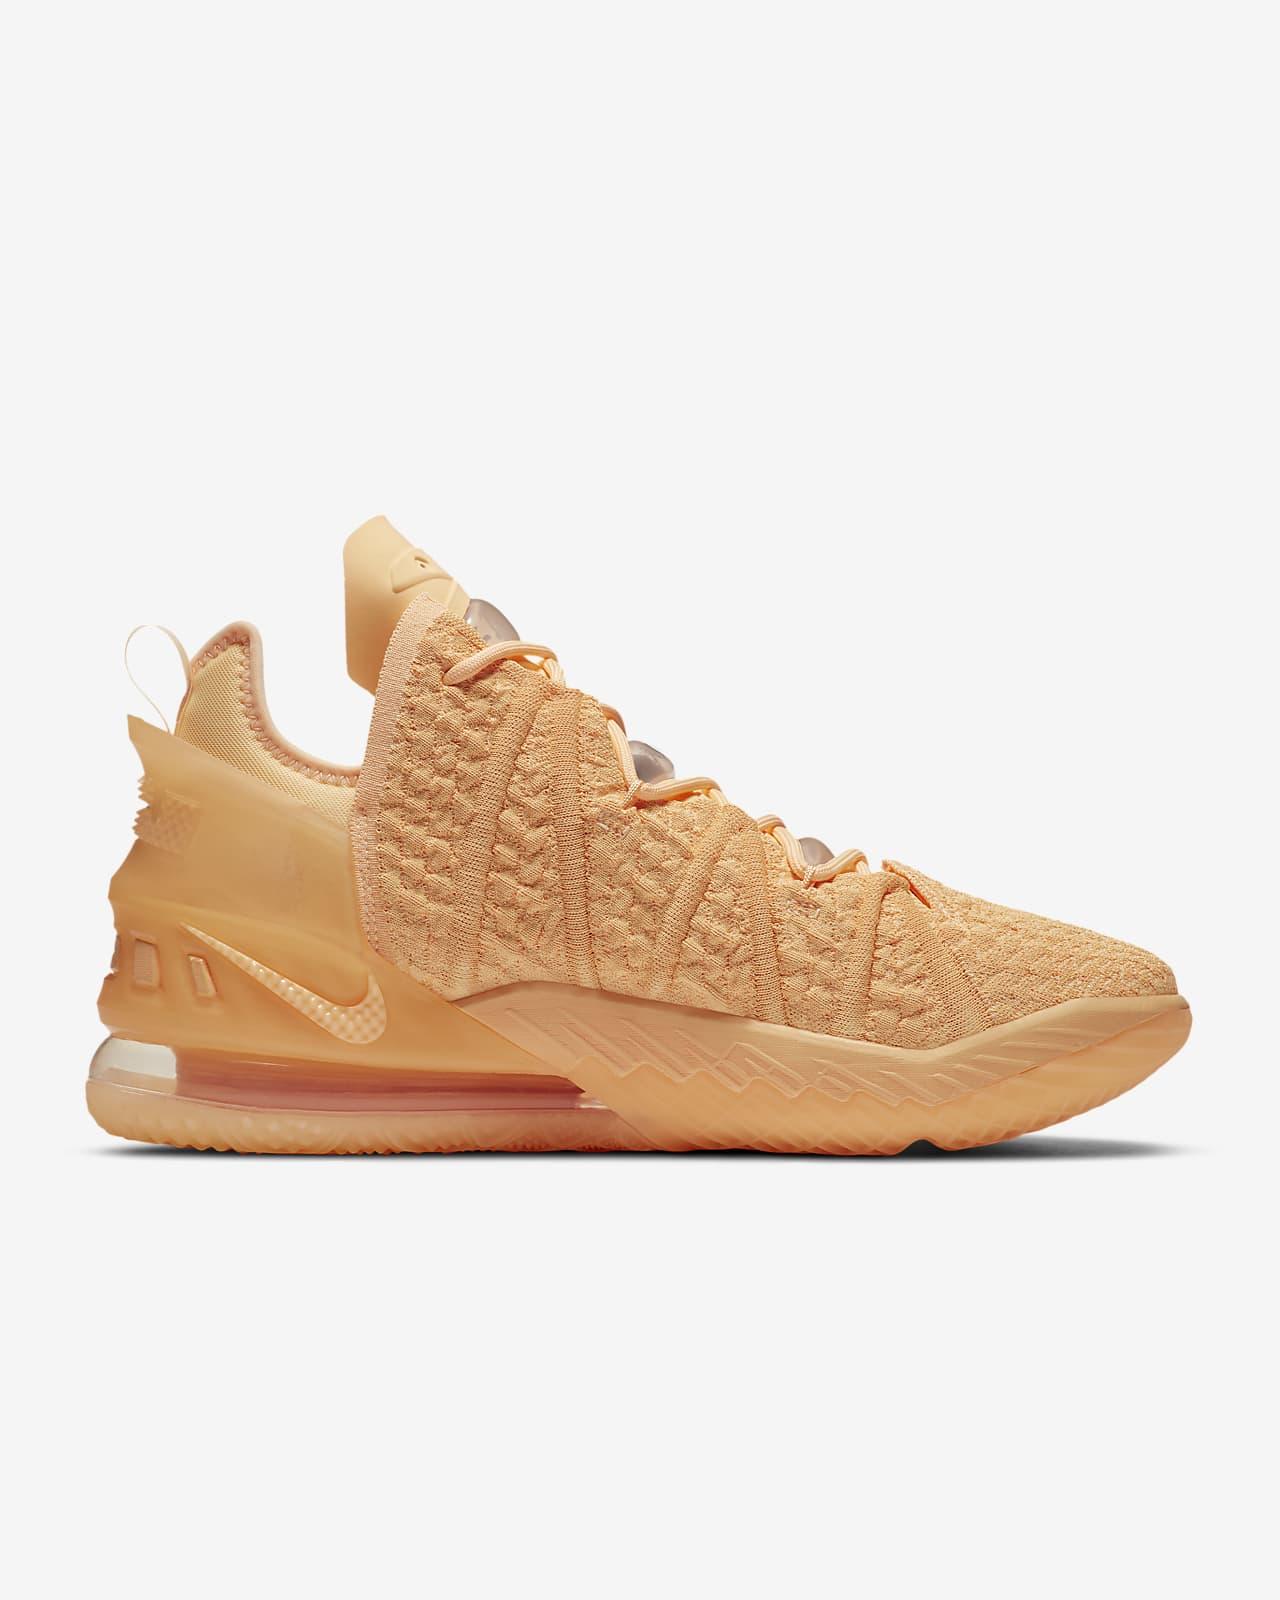 Lebron 18 Sisterhood Basketball Shoe Nike Id